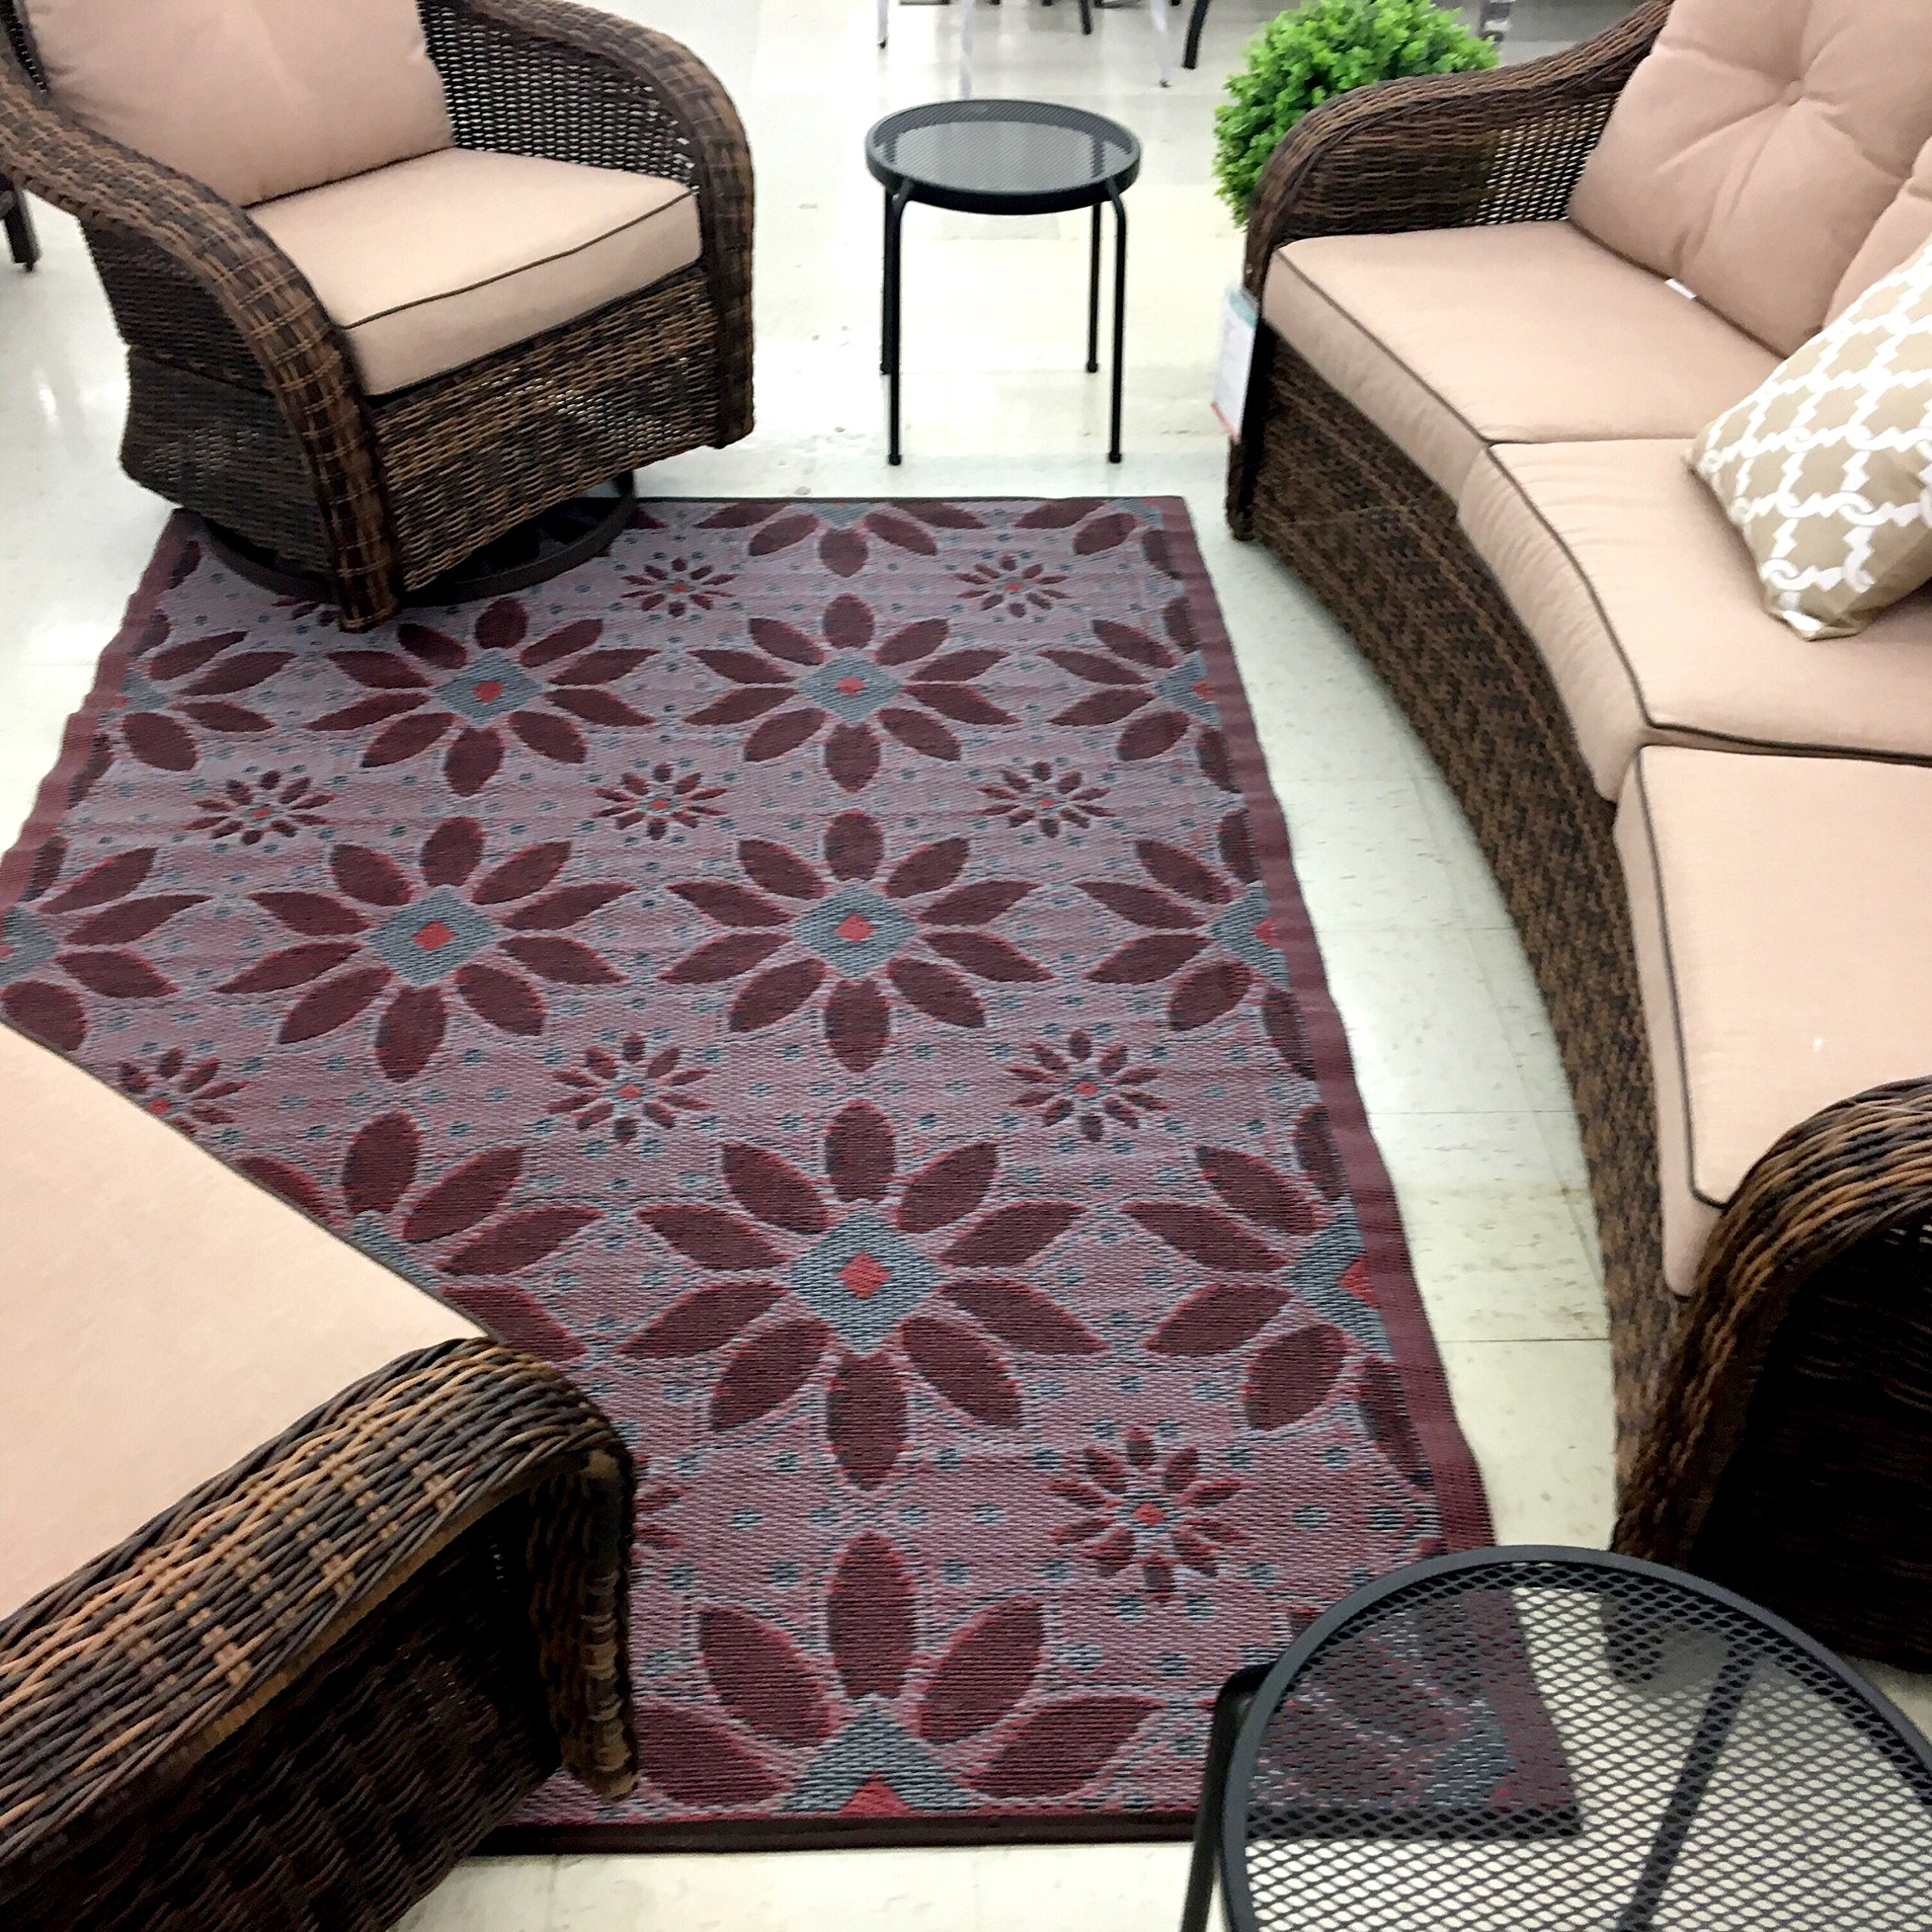 2 Pk 5'x7' Reversible indoor Outdoor Rugs Rv camping picnic Patio rug mat 20218